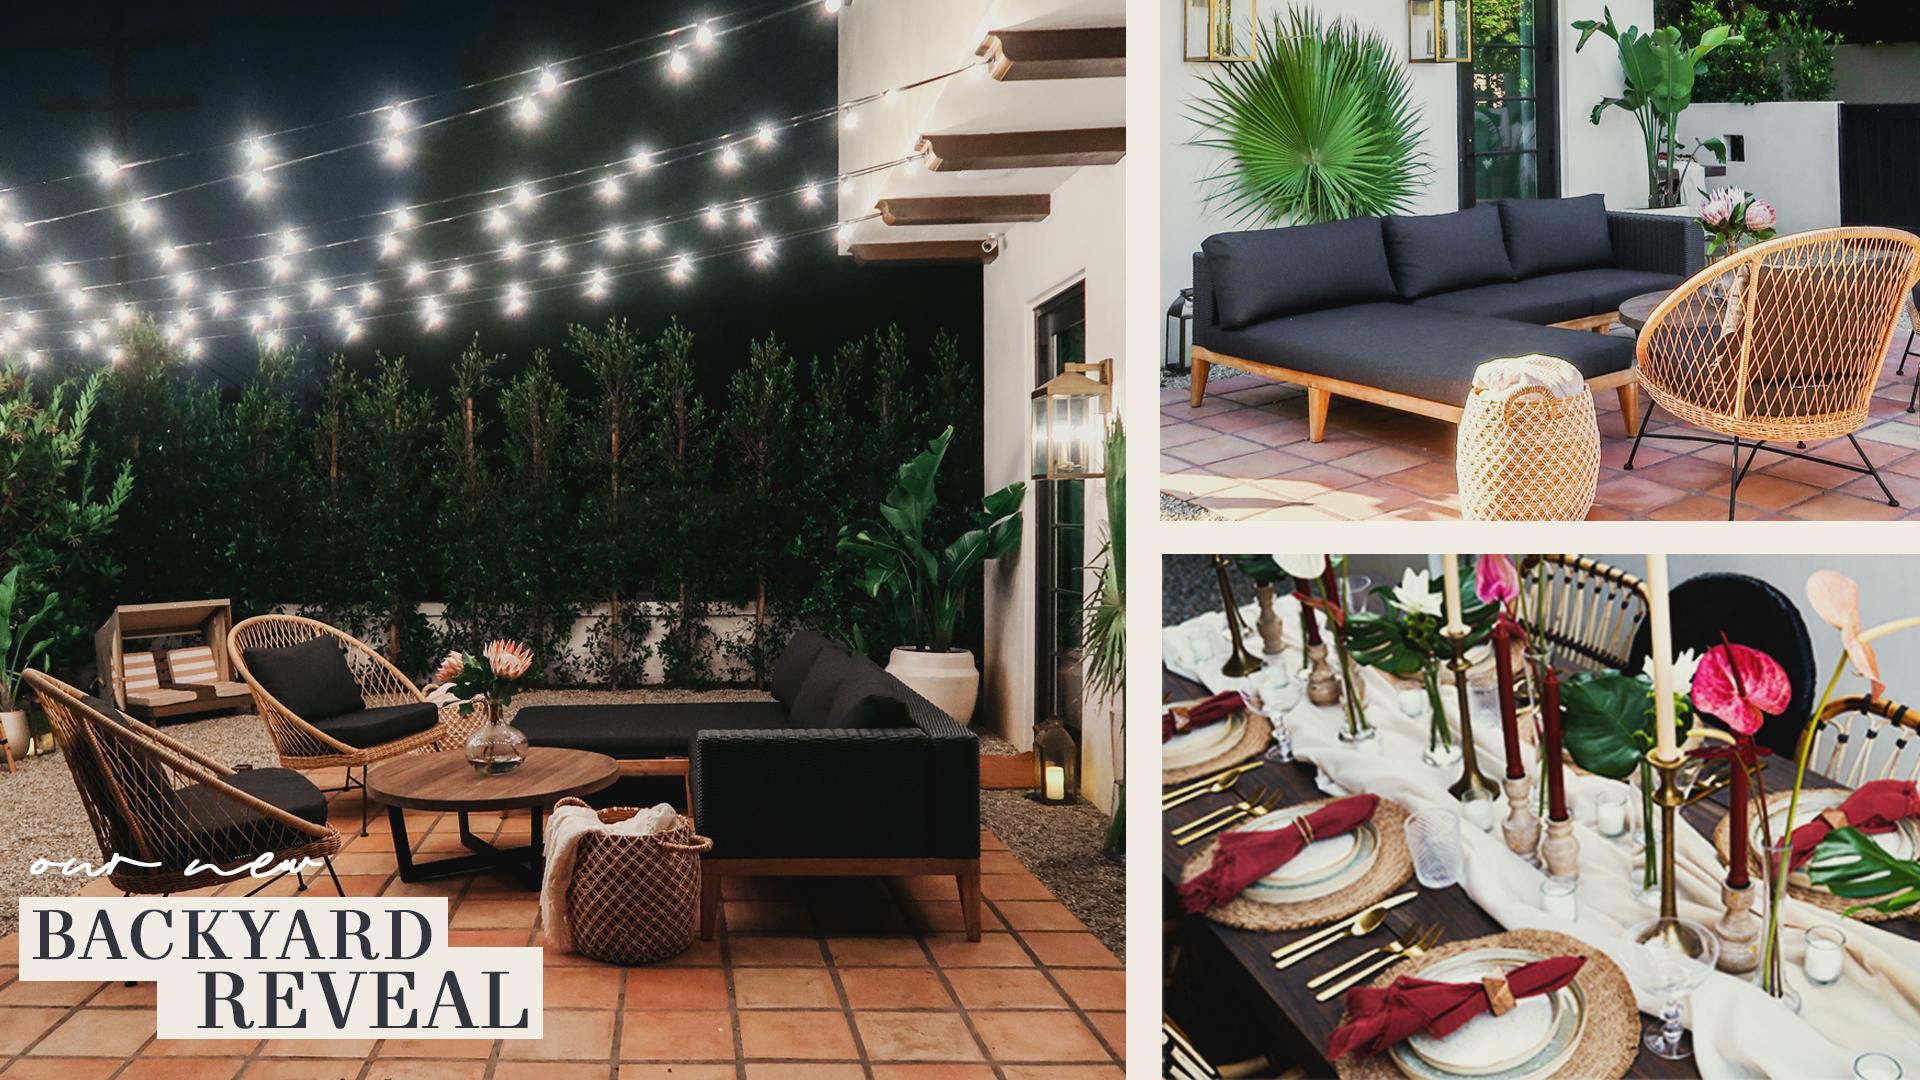 Jessi Malay backyard reveal artcile furniture